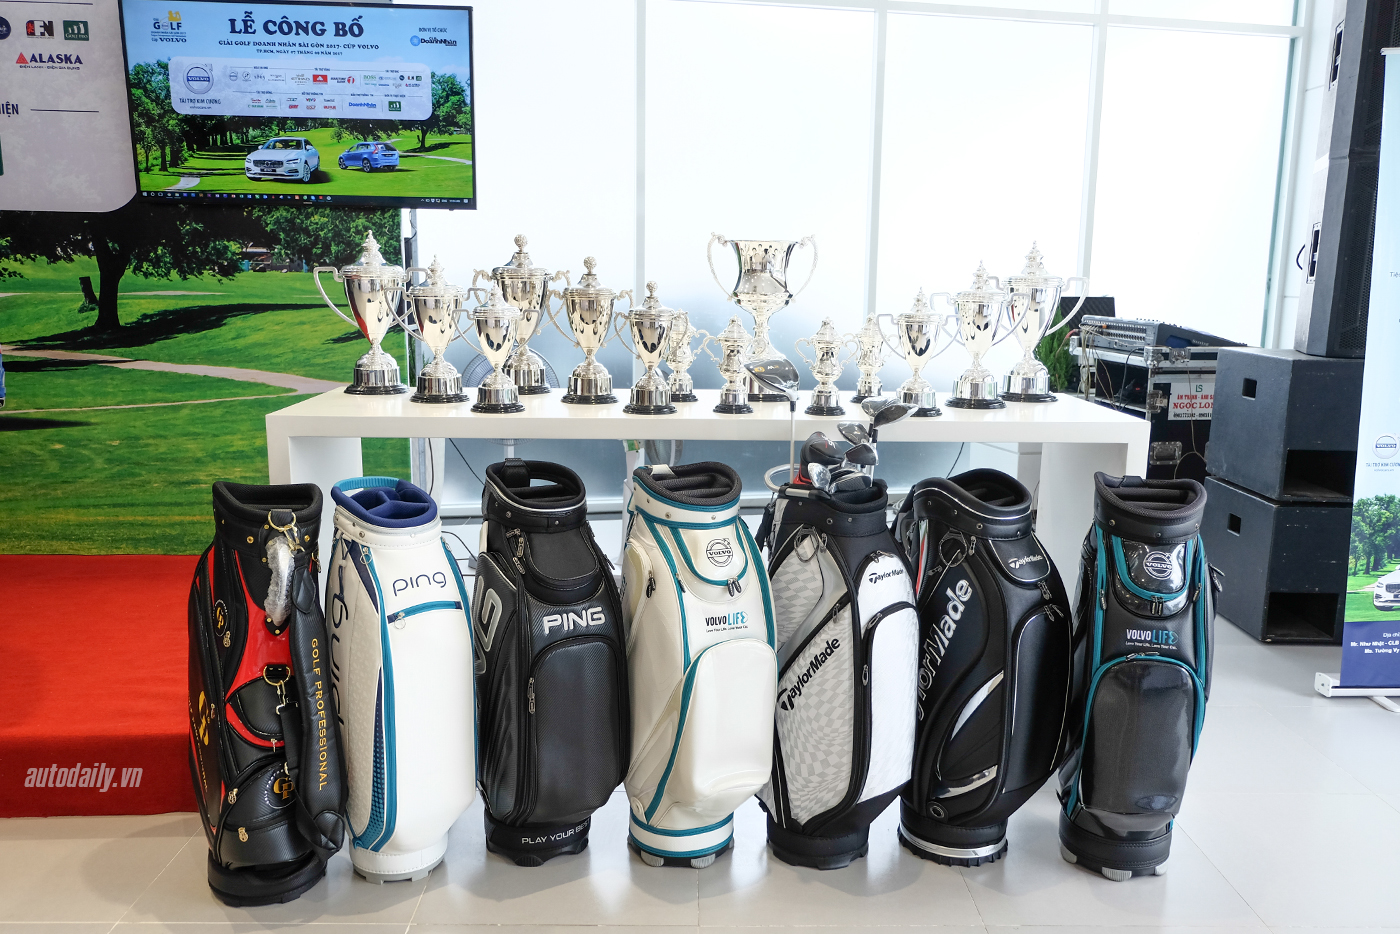 volvo-golf-cup-2.jpg